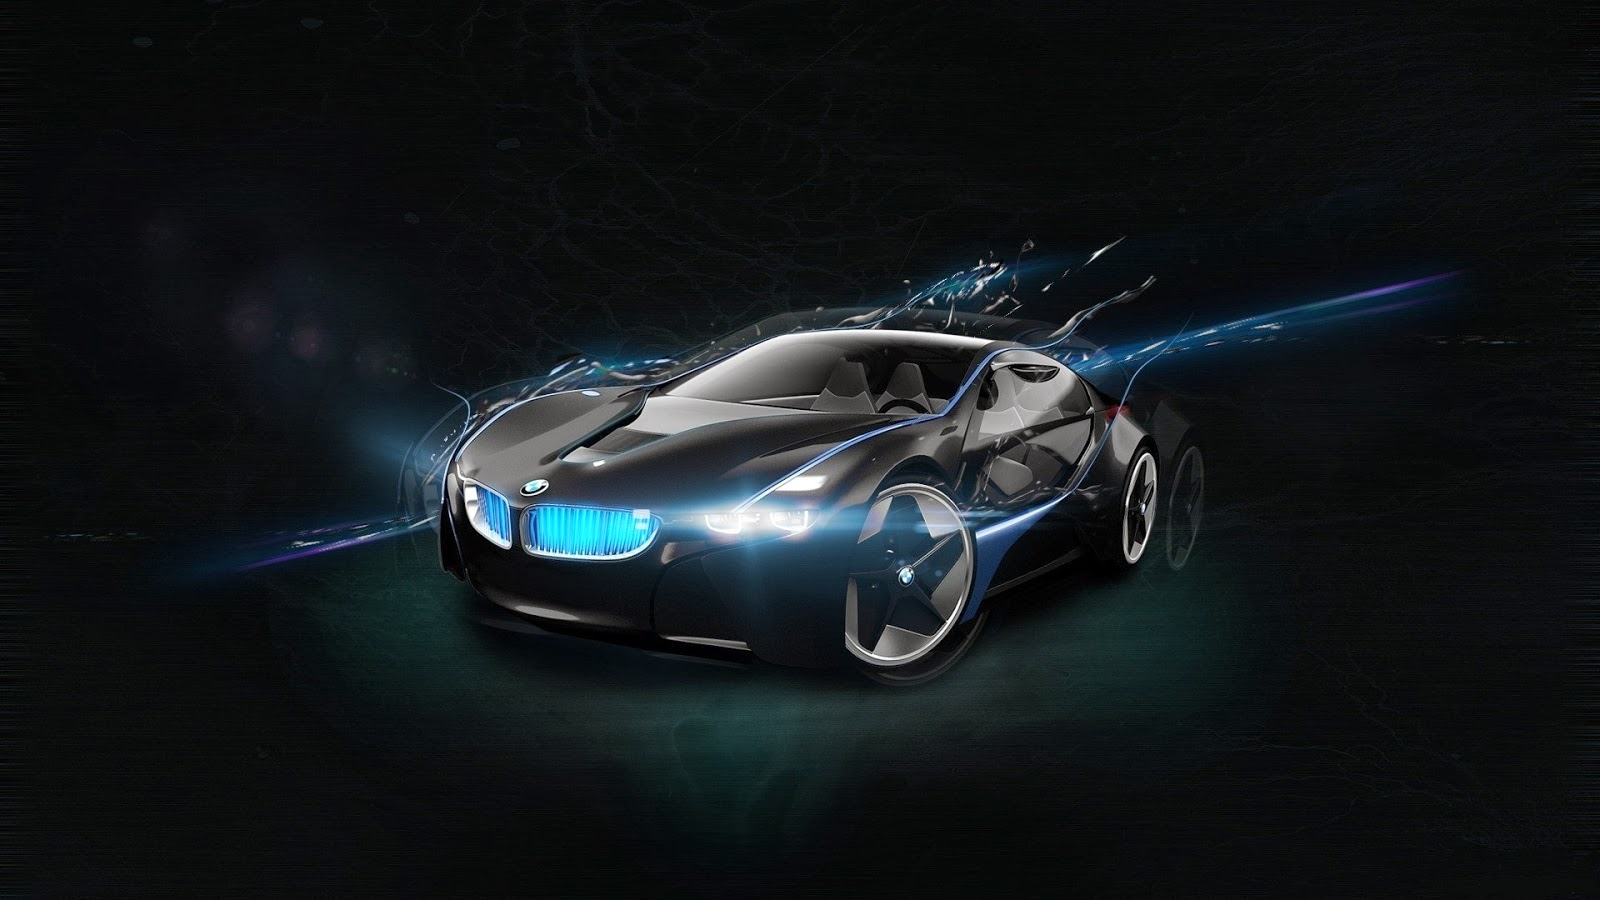 Bmw Car Wallpaper Hd 1080p Free Download Eos Forex Ea Review